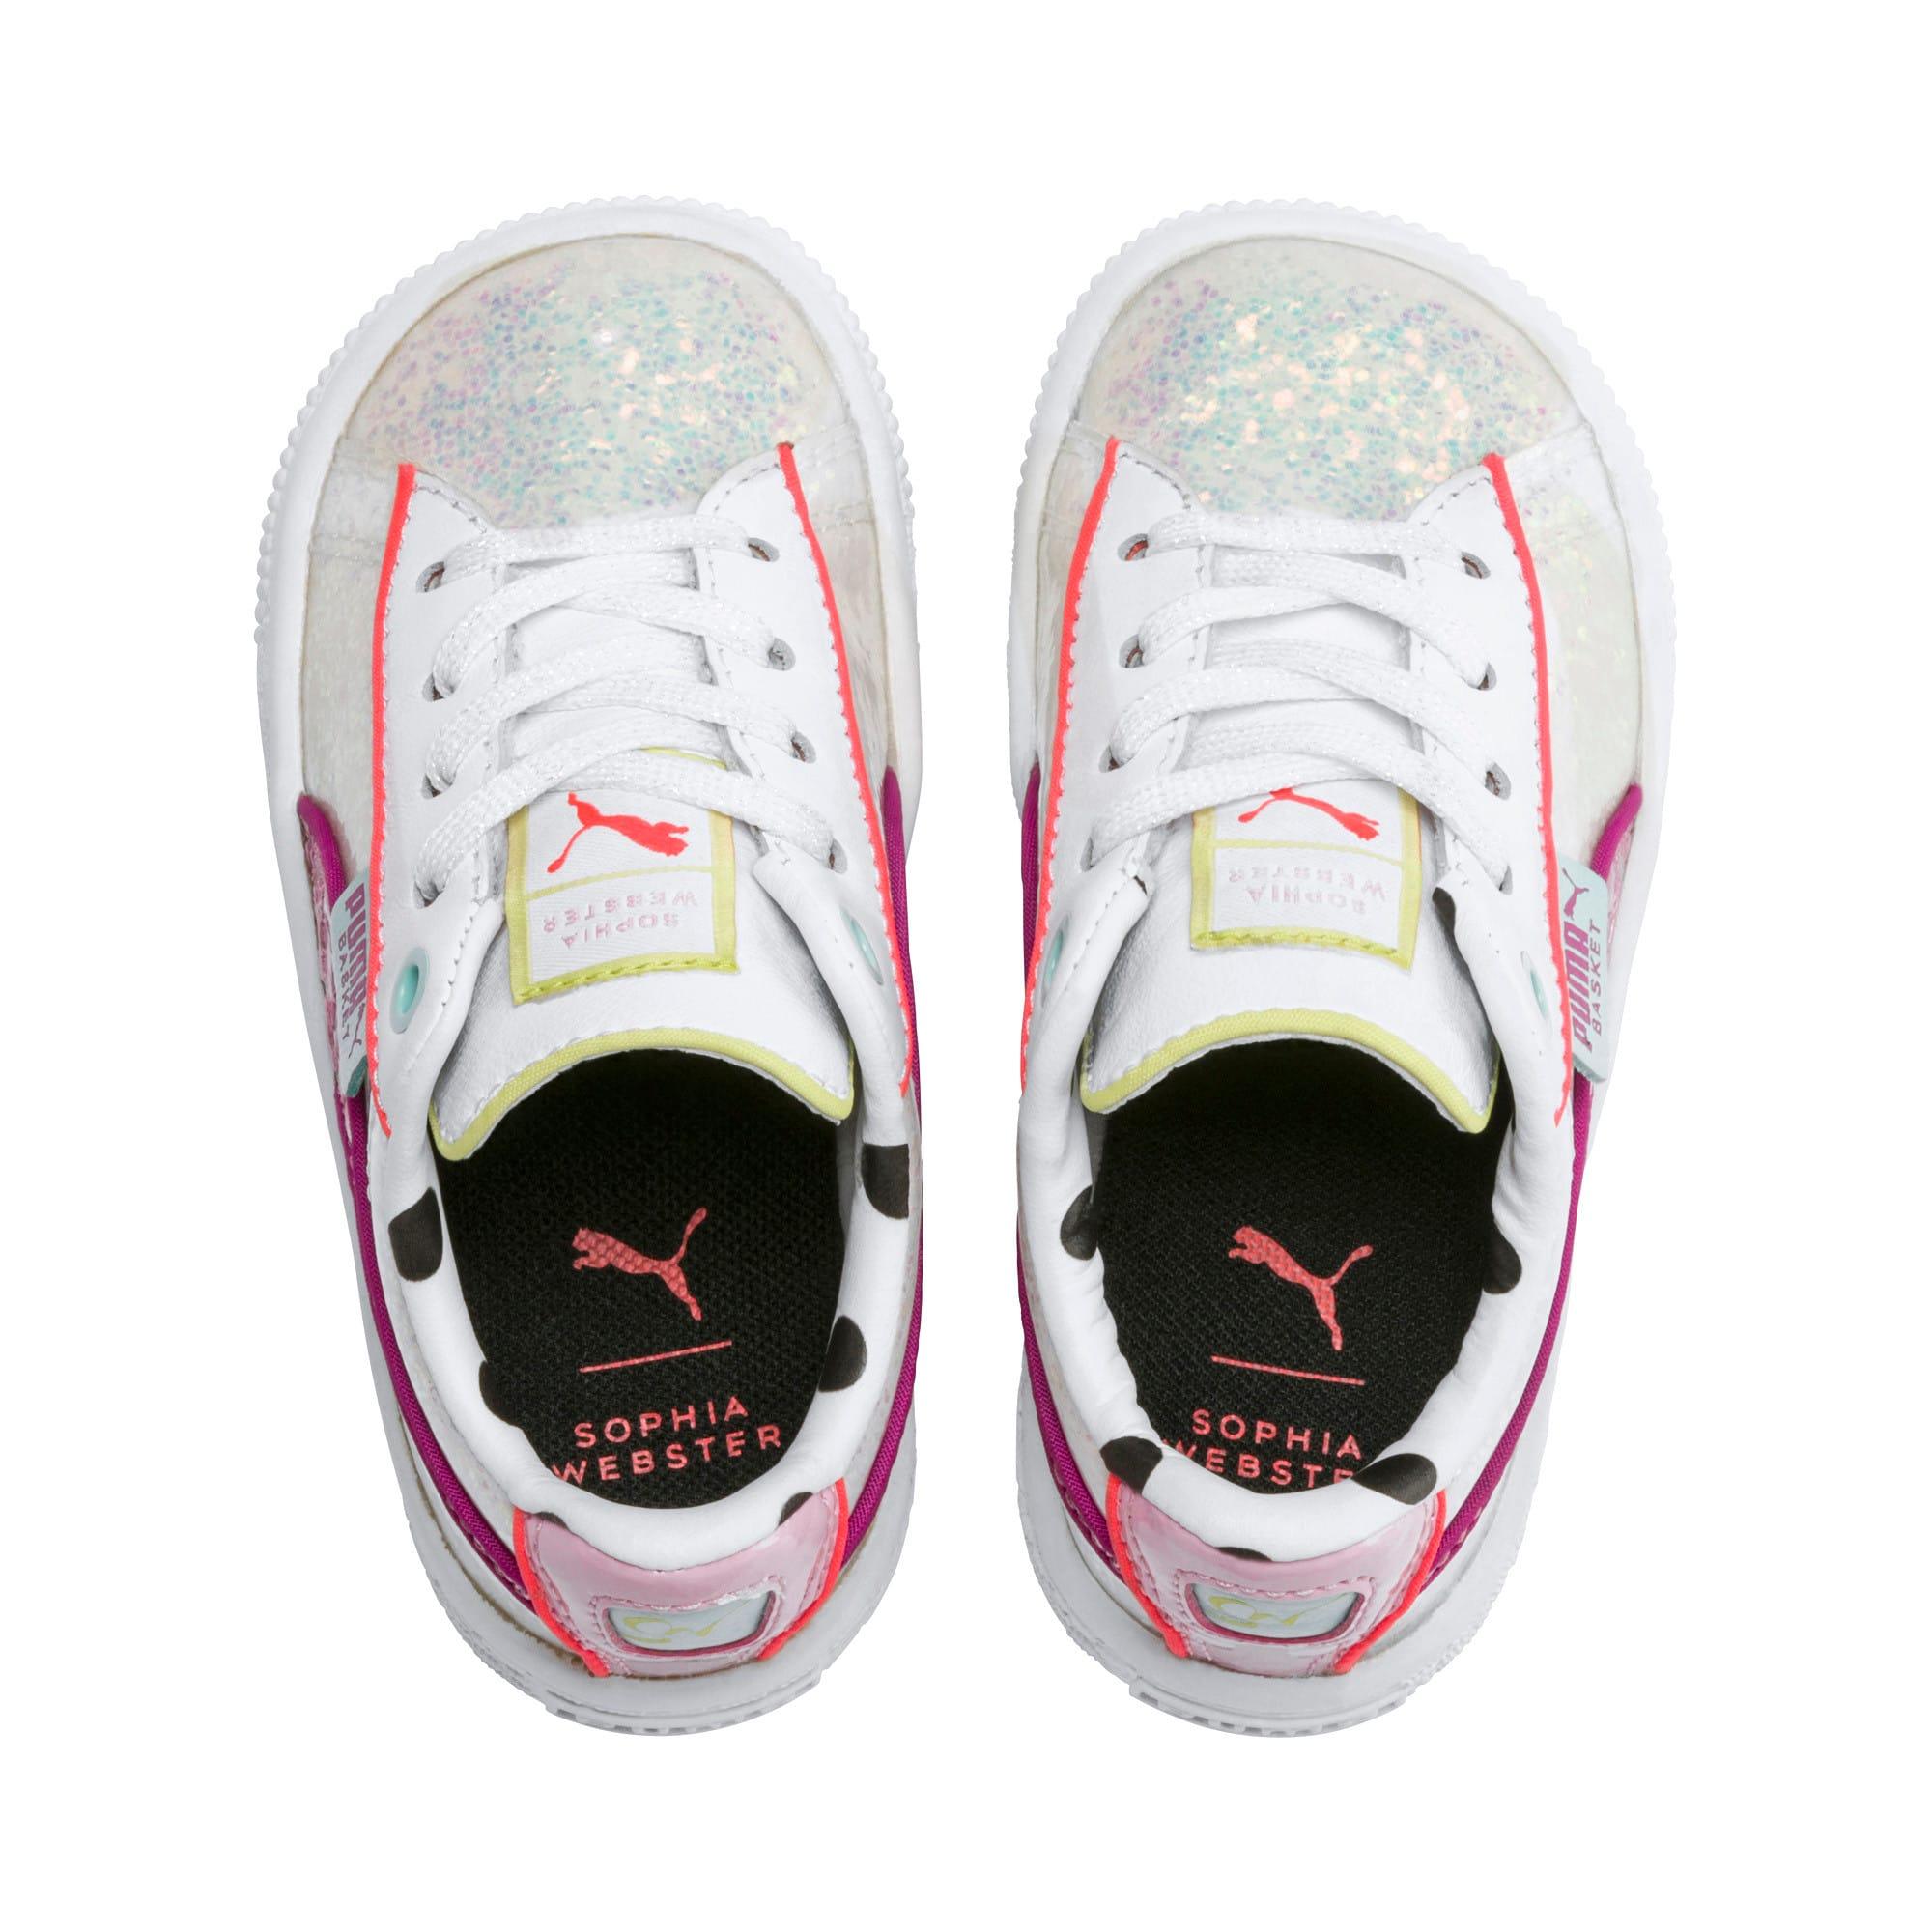 Miniatura 6 de ZapatosPUMA x SOPHIA WEBSTER Basket para bebés, Puma White-Pale Pink, mediano